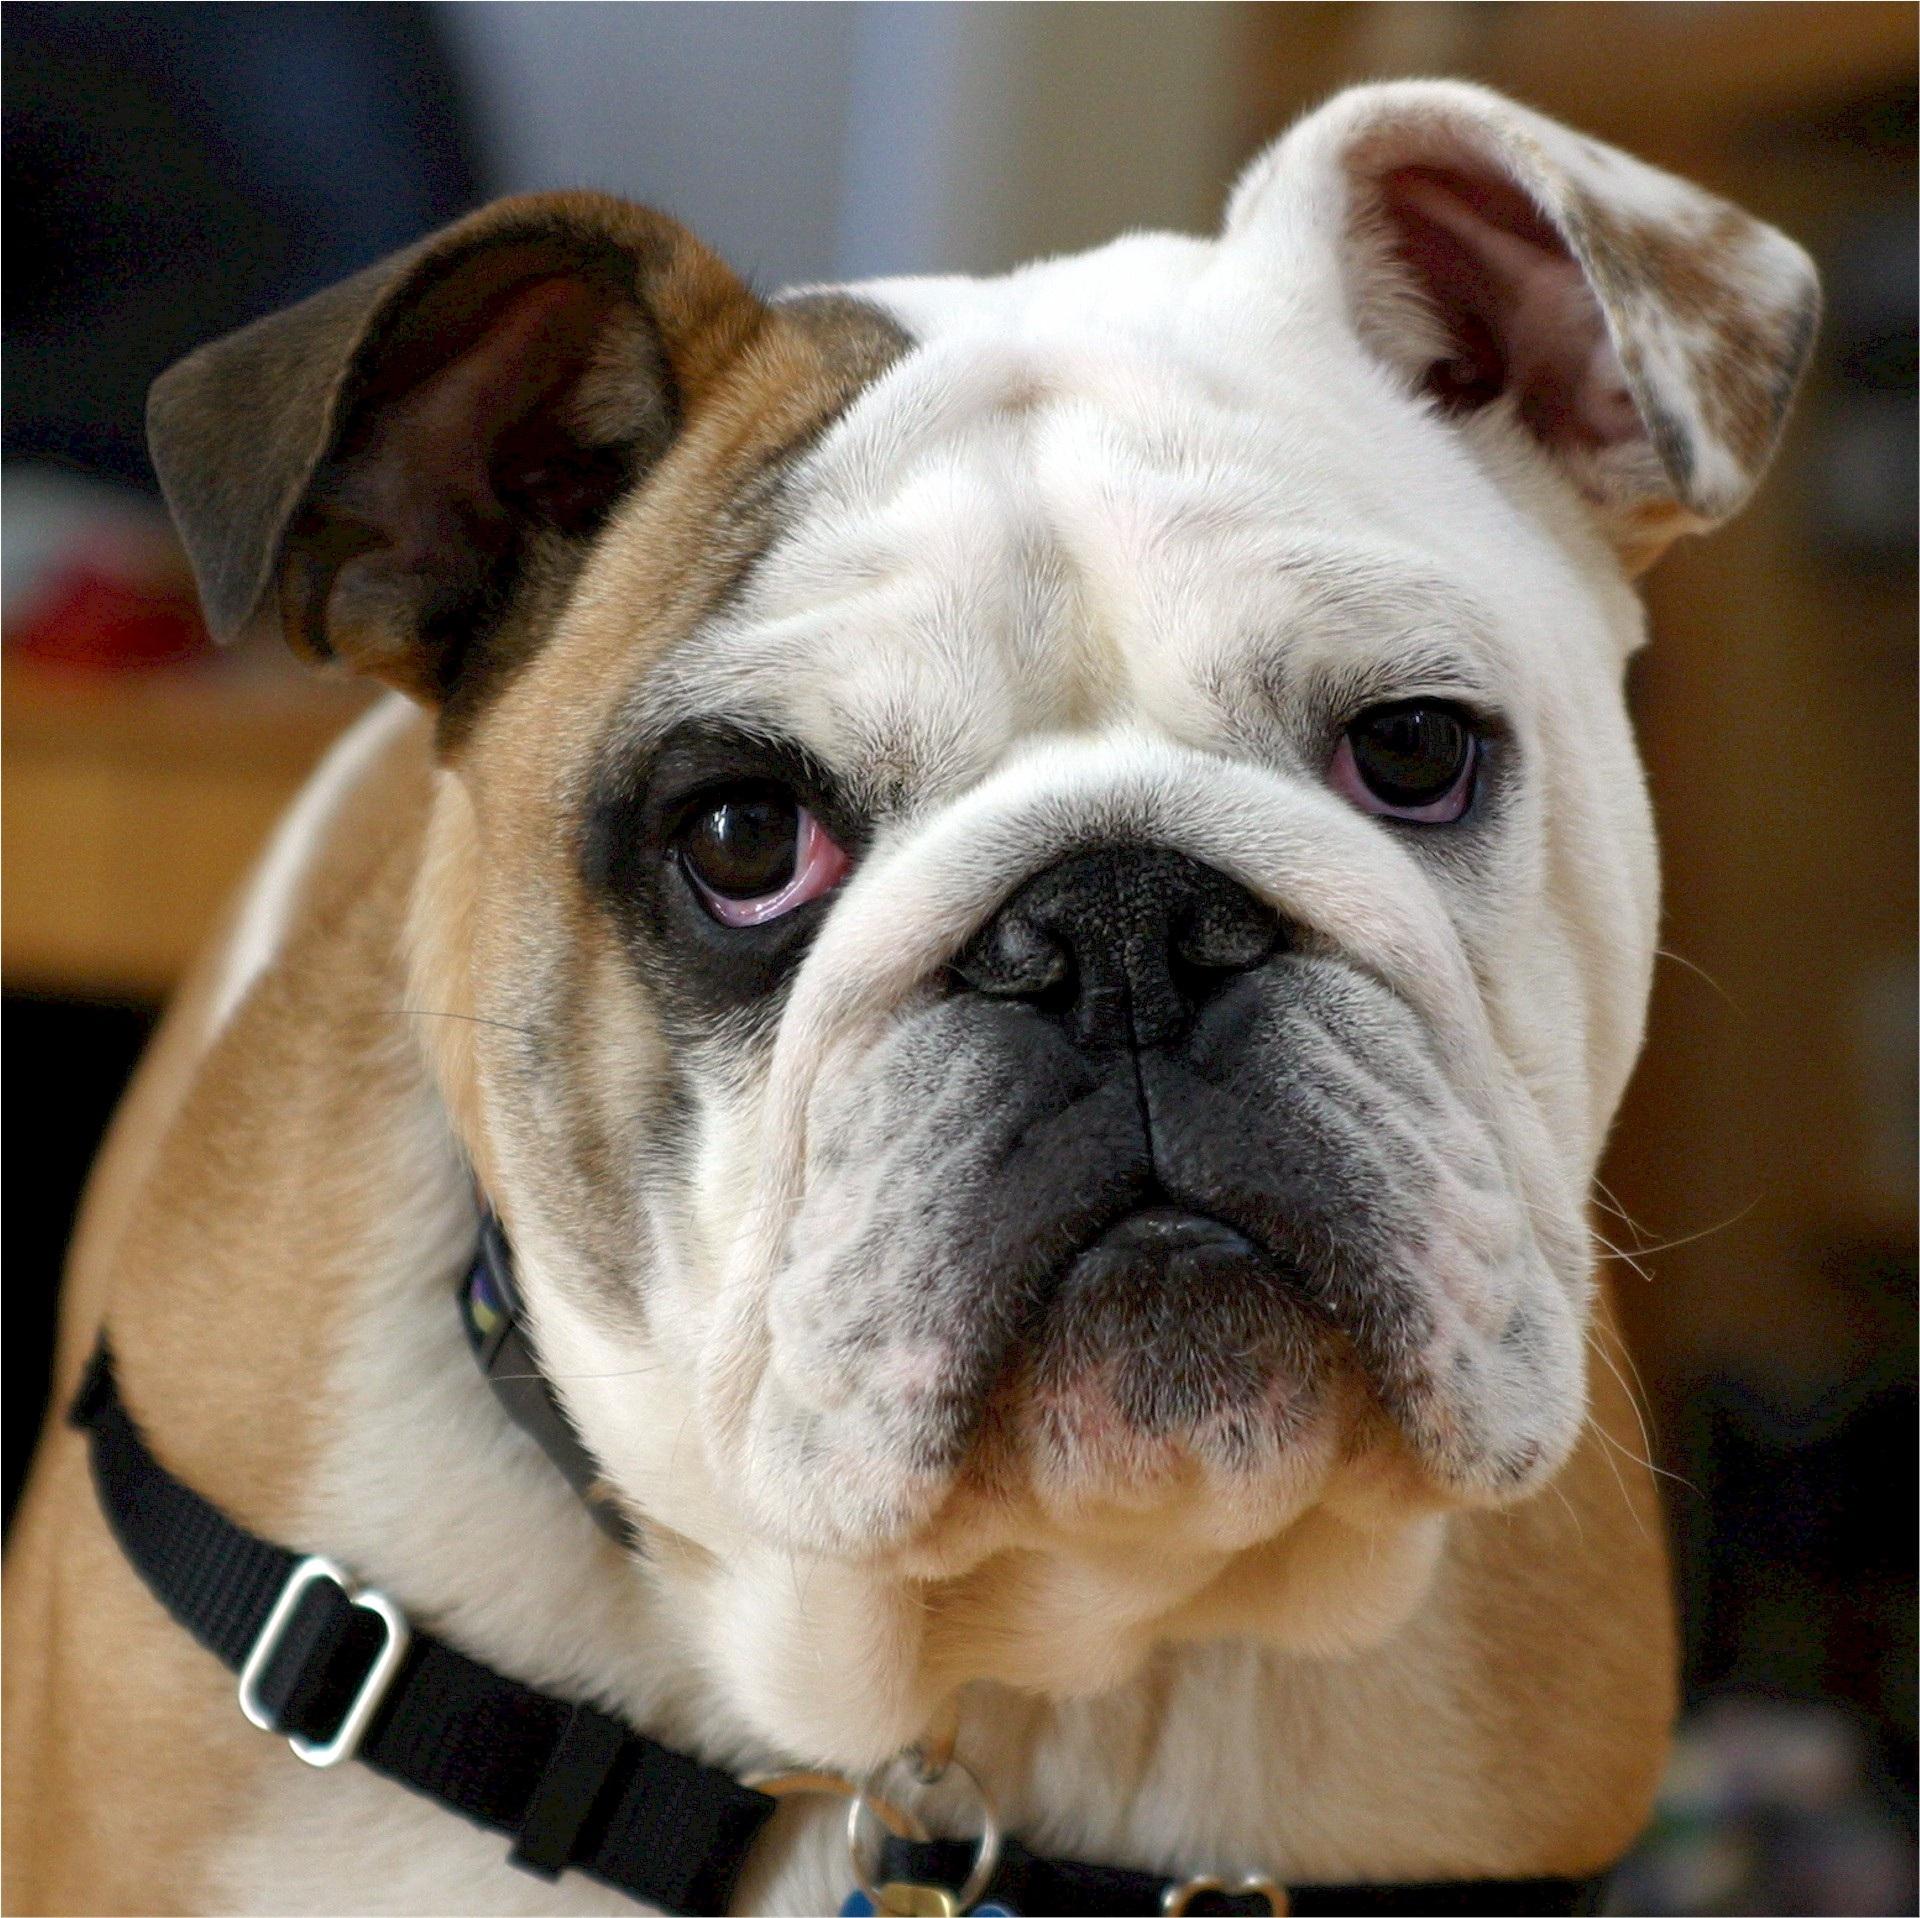 Best Bulldog Canine Adorable Dog - dog-canine-portrait-mammal-bulldog-face-vertebrate-adorable-french-bulldog-dog-breed-wrinkled-stout-tenacious-english-bulldog-stubborn-old-english-bulldog-dog-like-mammal-olde-english-bulldogge-toy-bulldog-british-bulldogs-australian-bulldog-white-english-bulldog-american-bulldog-771758  Photograph_797581  .jpg